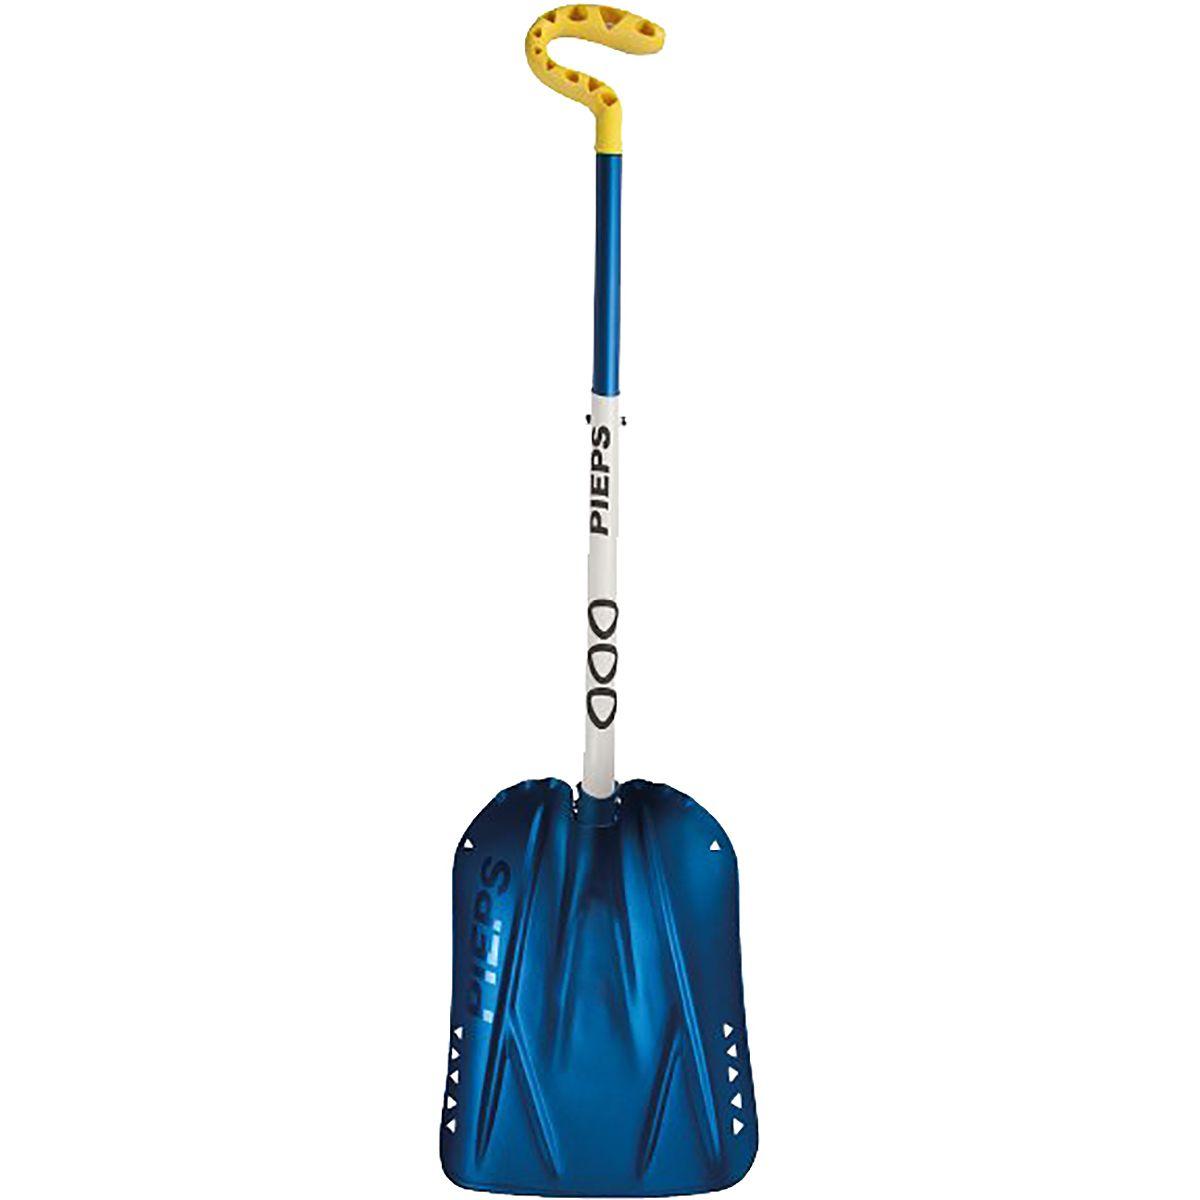 photo: Pieps C 660 Shovel snow shovel